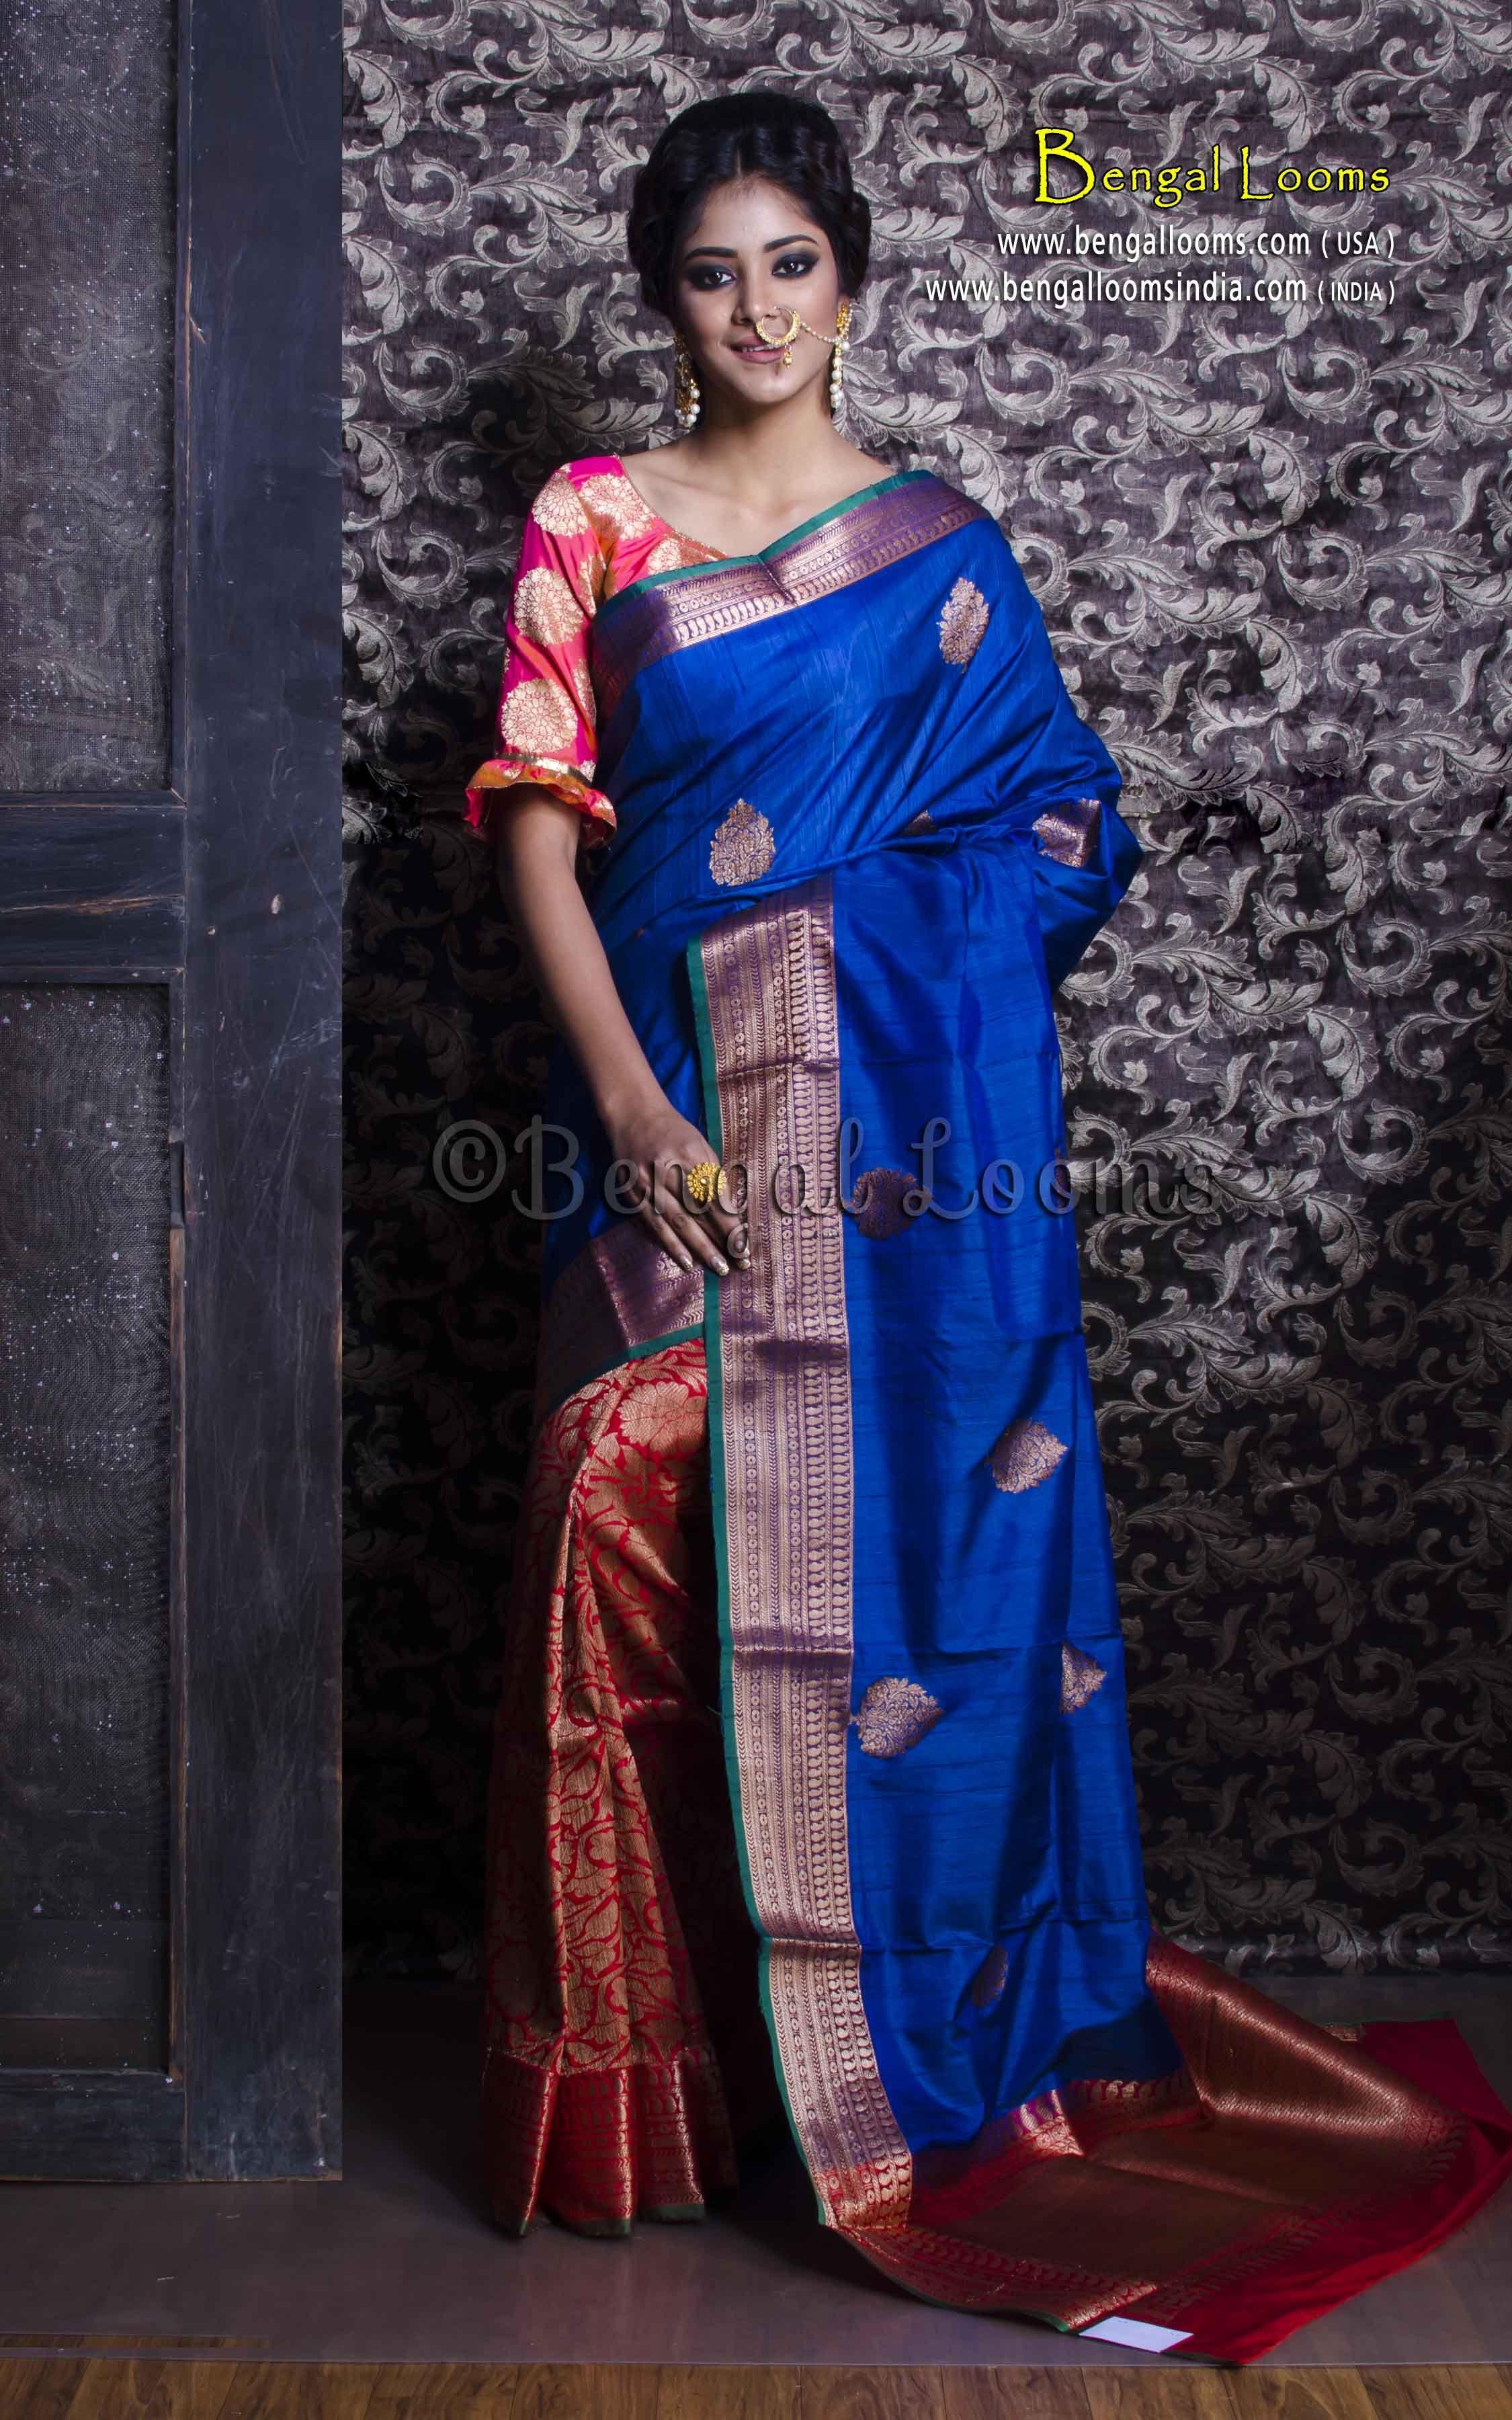 1b15f6ee11b1a Pure Handloom Patli Pallu Tussar Banarasi Saree in Royal Blue and ...